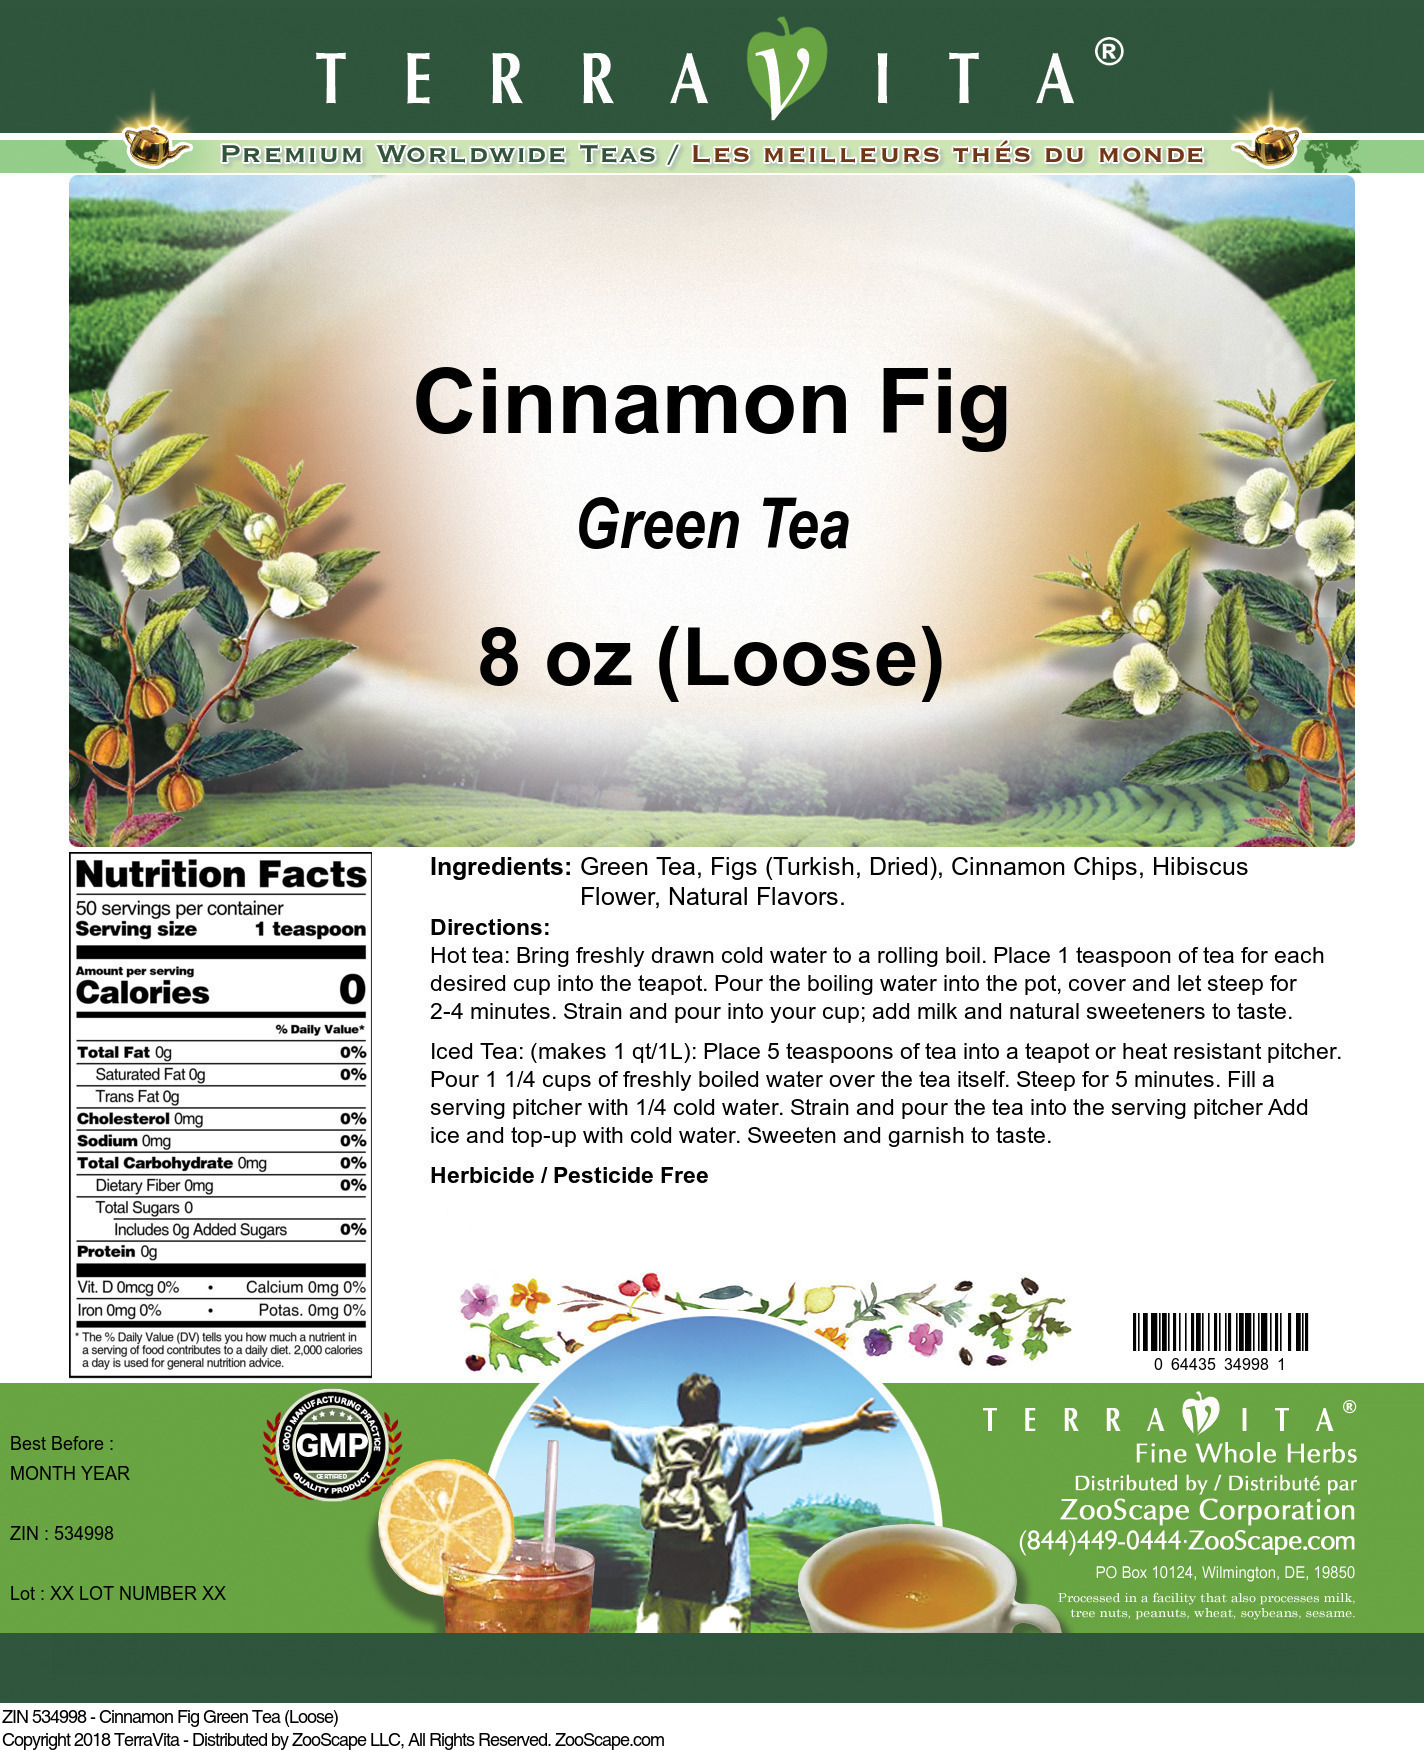 Cinnamon Fig Green Tea (Loose)